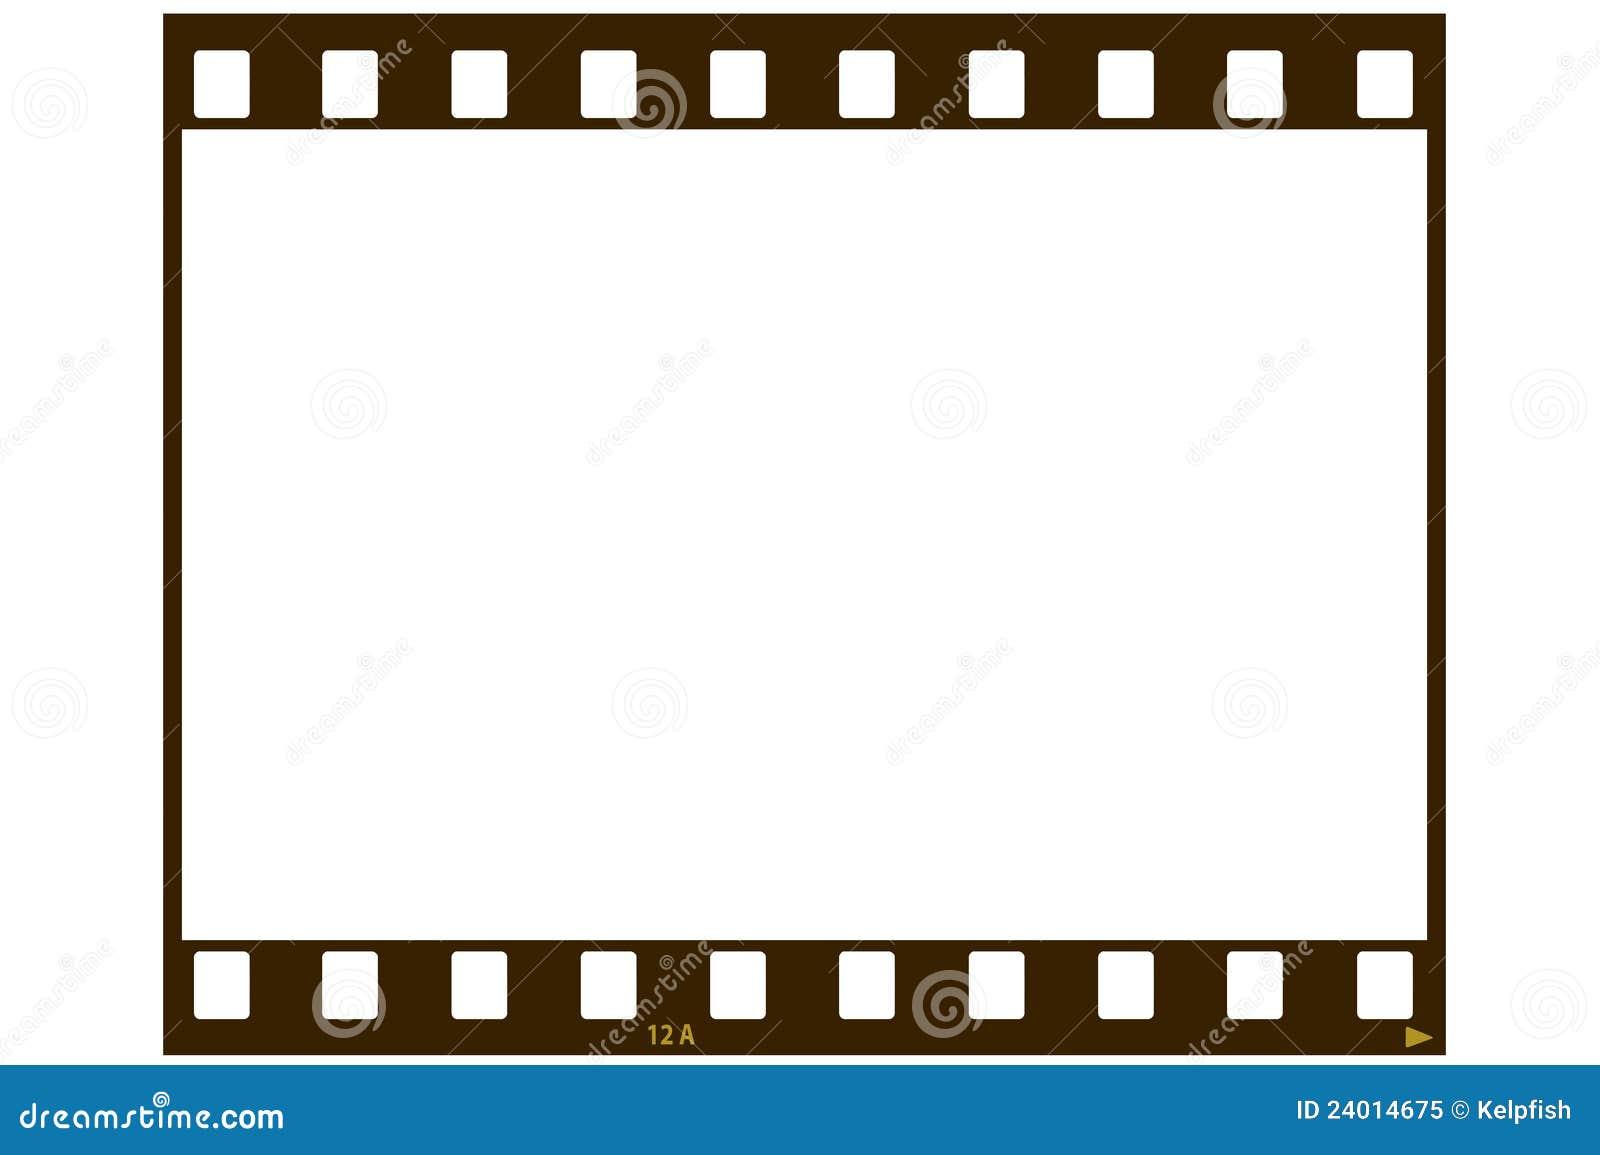 Blank Film Strip Royalty Free Stock Photo Image 24014675